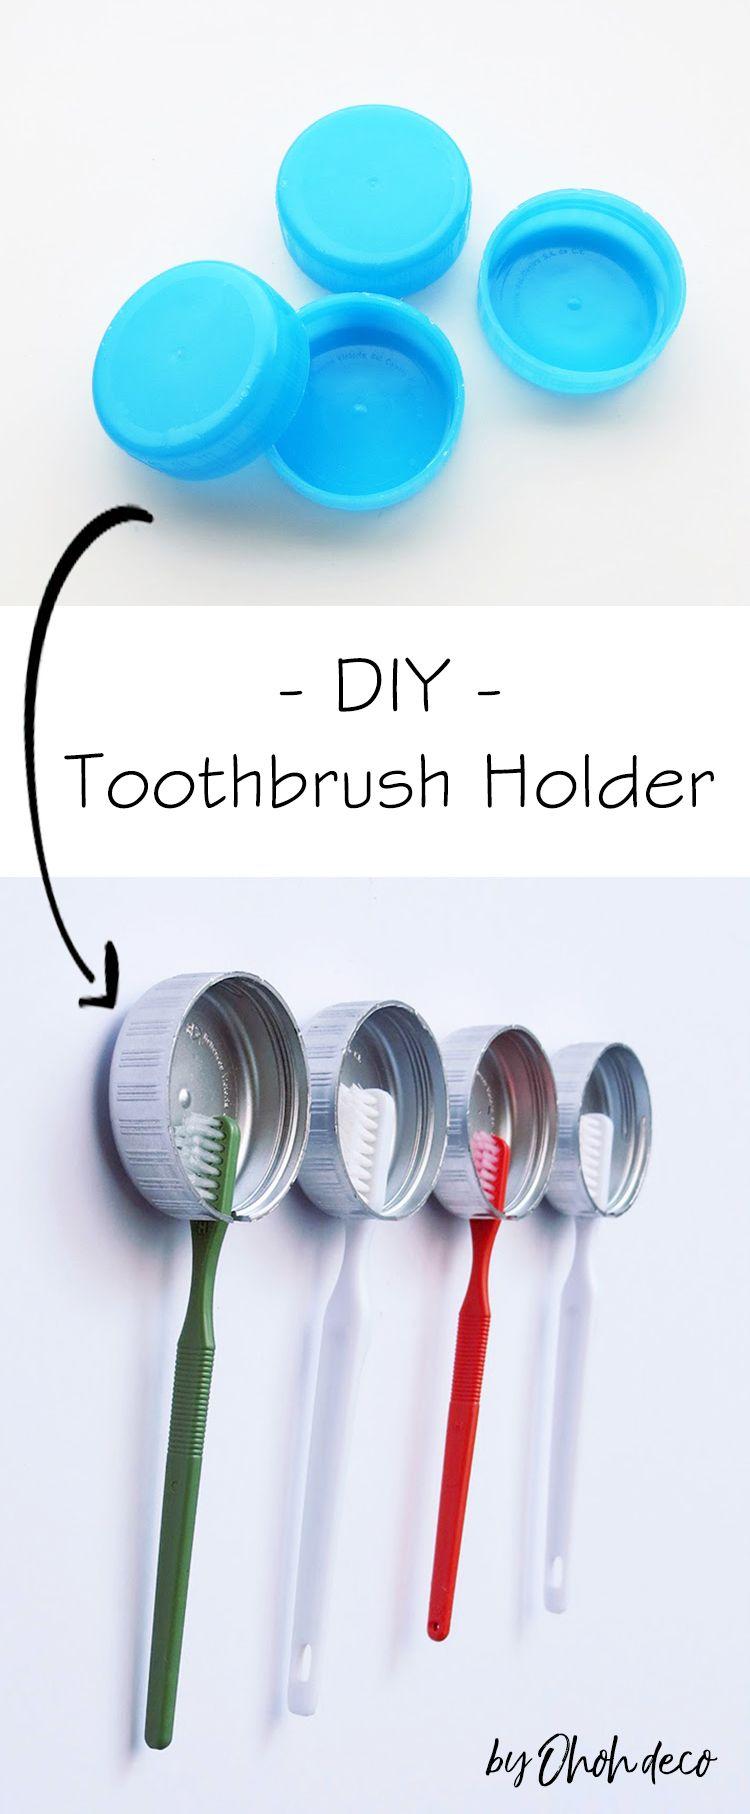 Use Plastic Caps To Make A Diy Toothbrush Holder So Easy And Practical Diy Bathroom Storage Toothbrus Diy Toothbrush Holder Diy Toothbrush Brushing Teeth